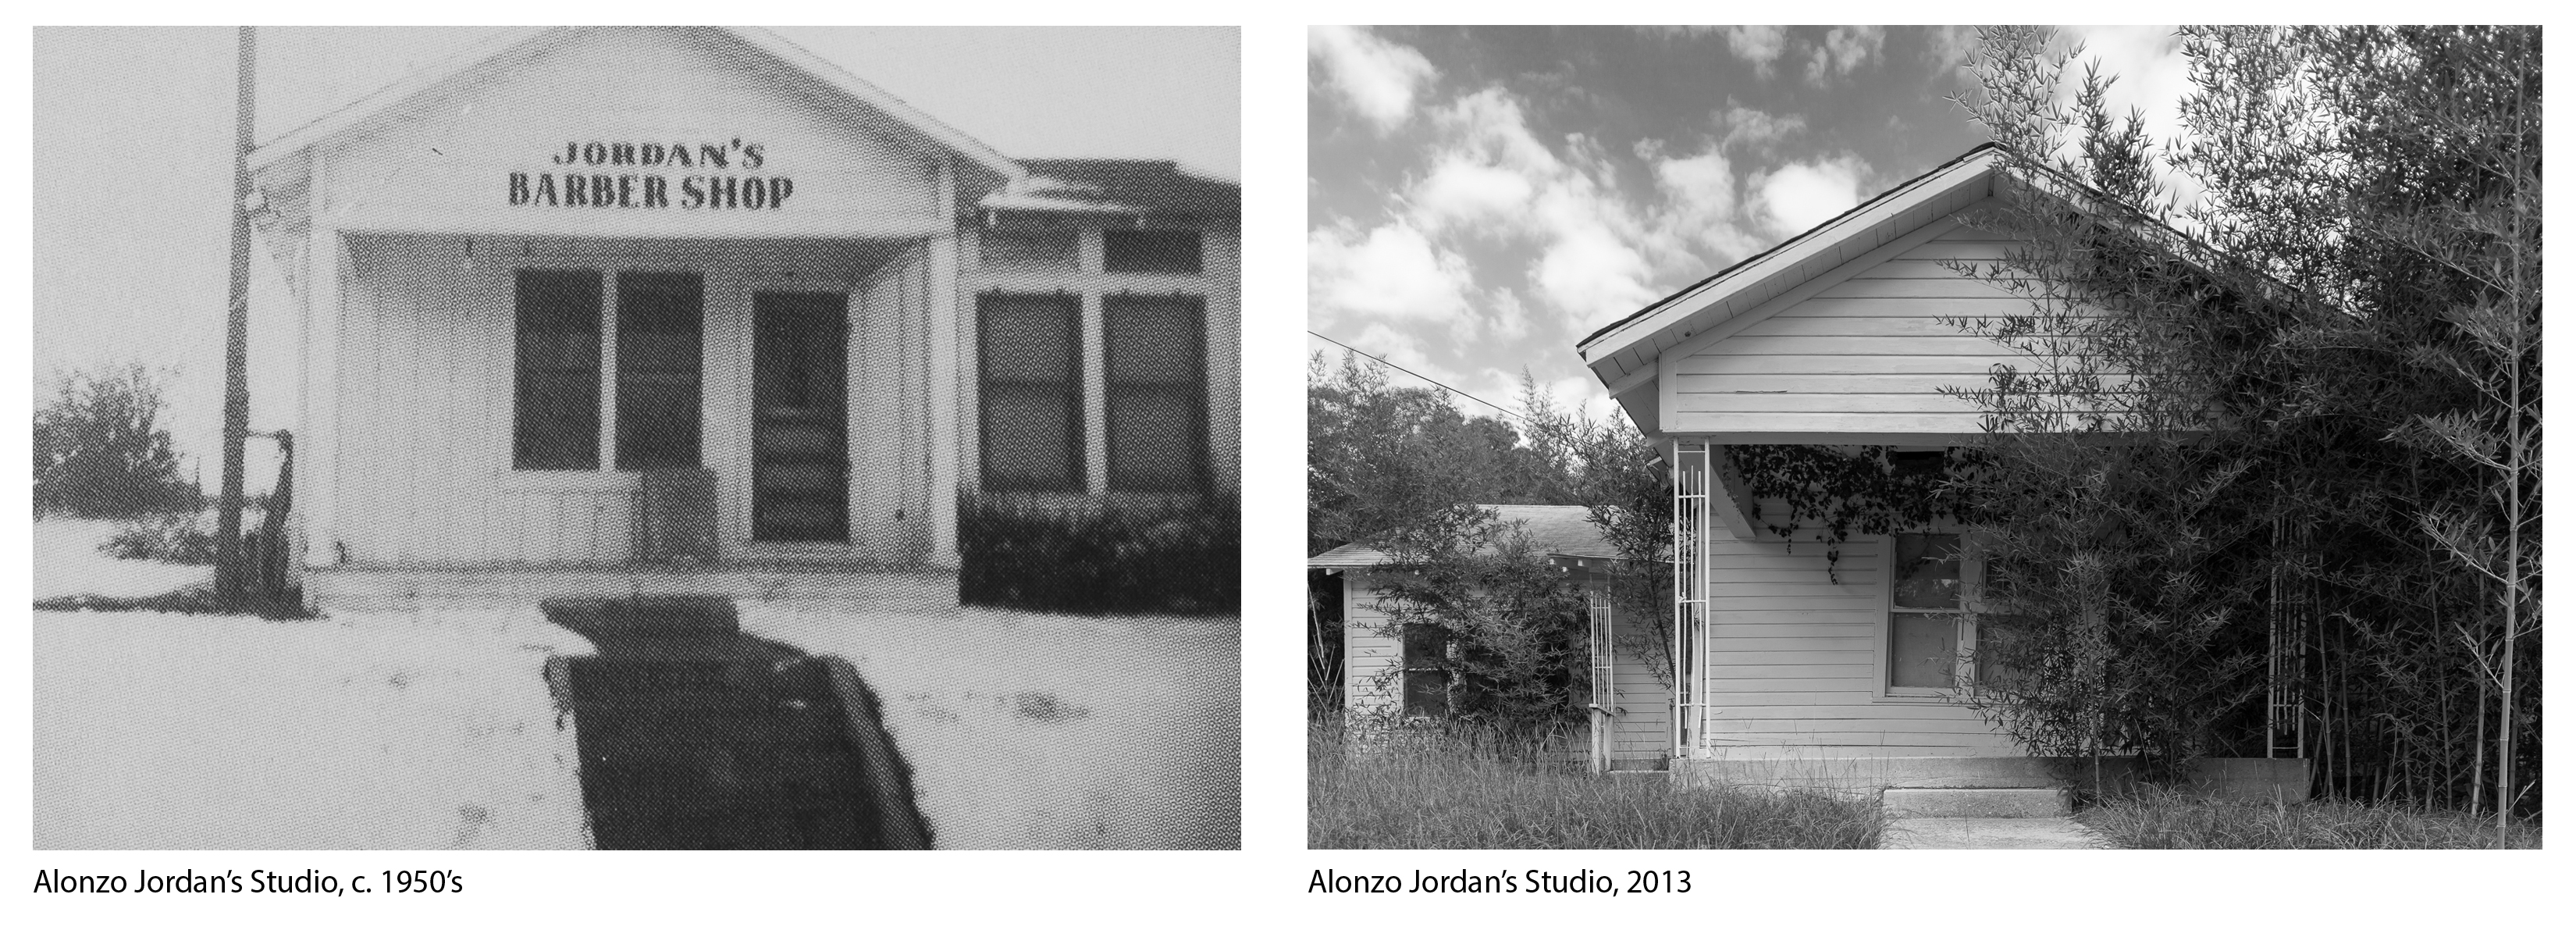 Alonzo Jordan's Studio, 1950c and 2013